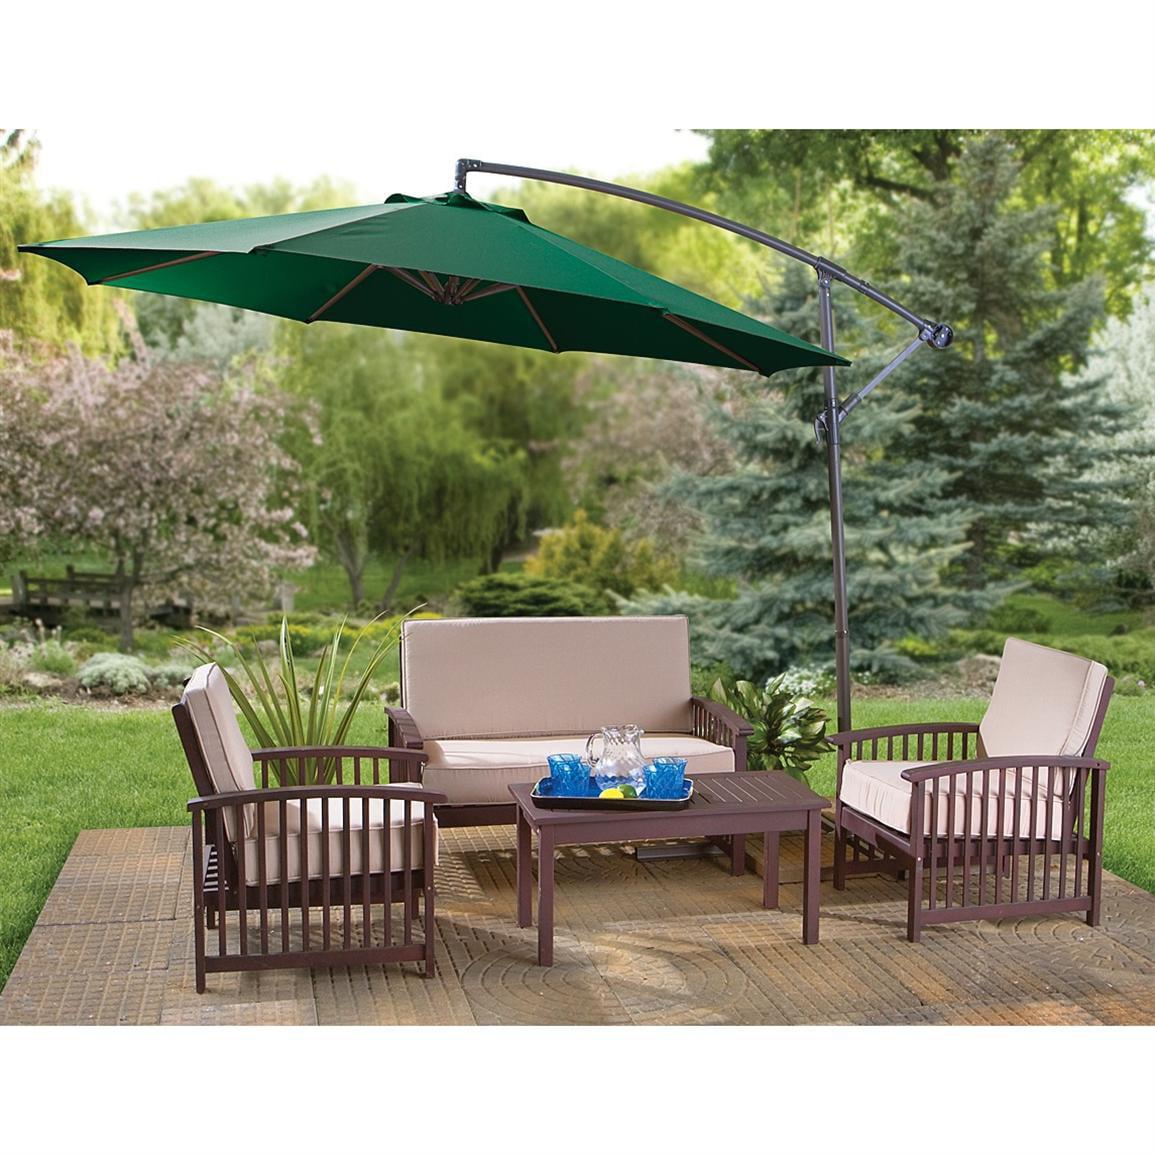 Belleze Premium Outdoor Patio Umbrella 10' Aluminum Cantilever Market Poly Tilt Hand Crank & Base, Beige